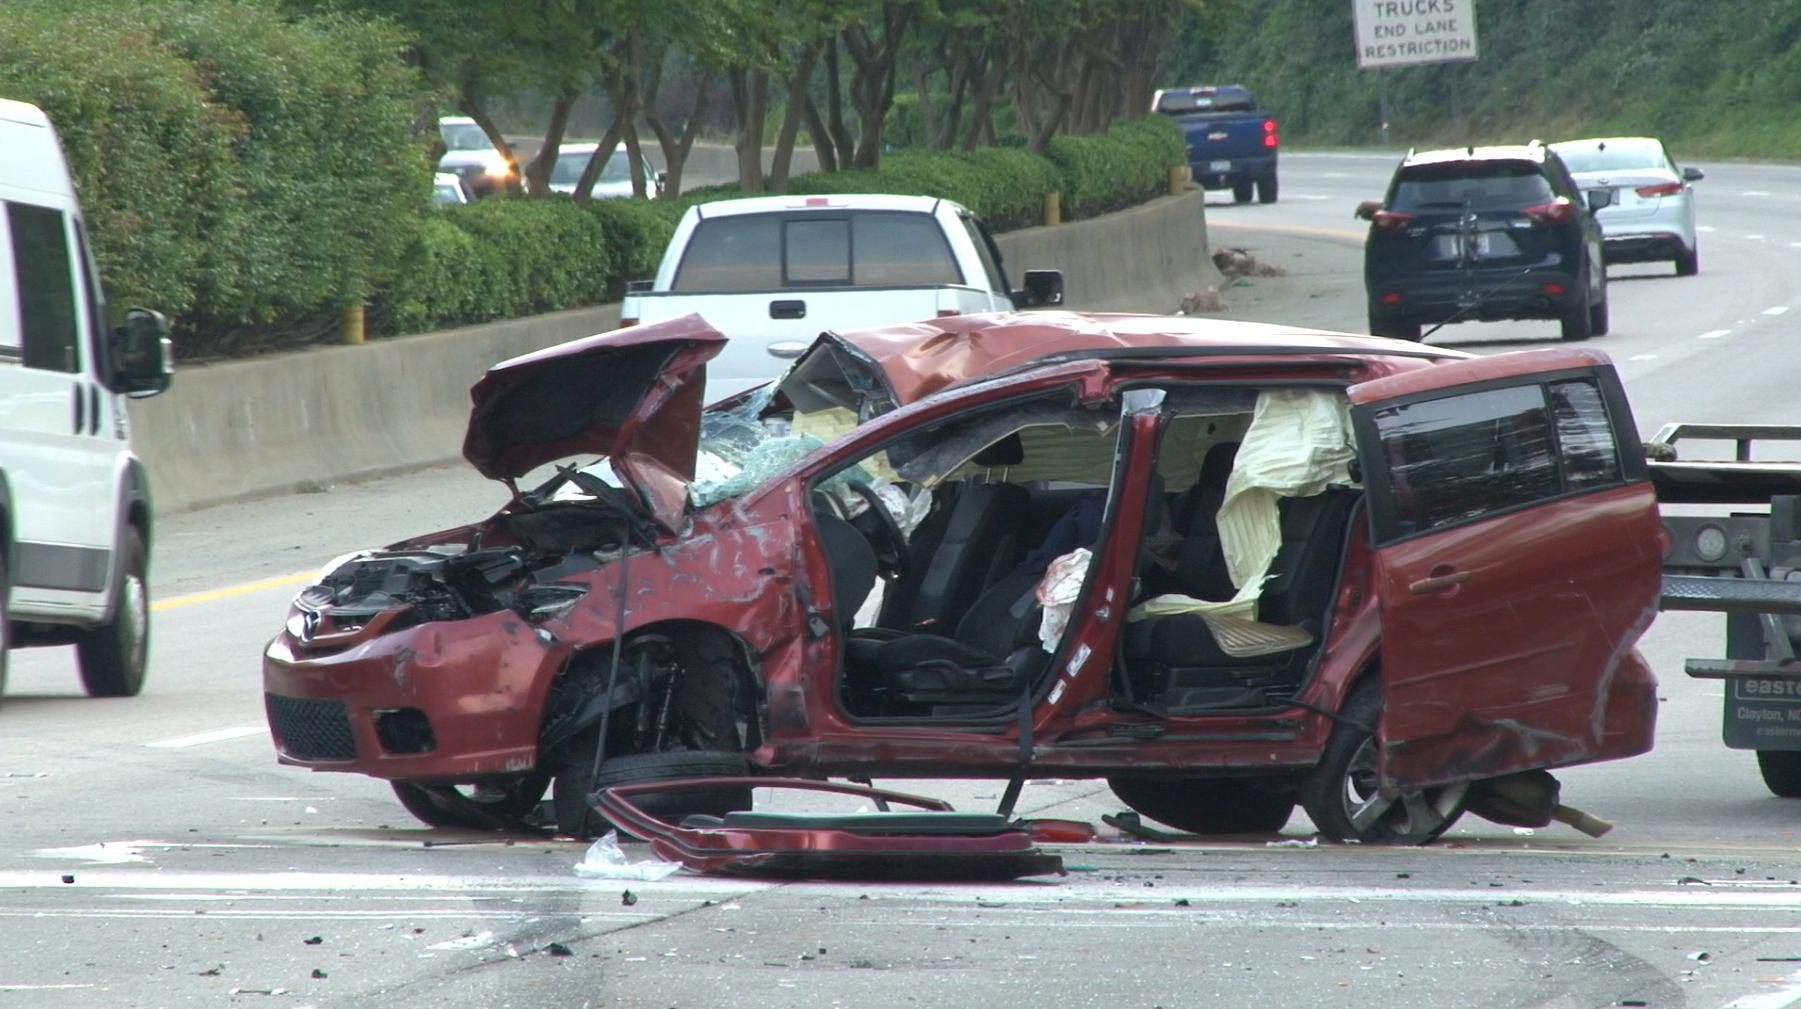 1 seriously injured after car flips over on I-440 :: WRAL com